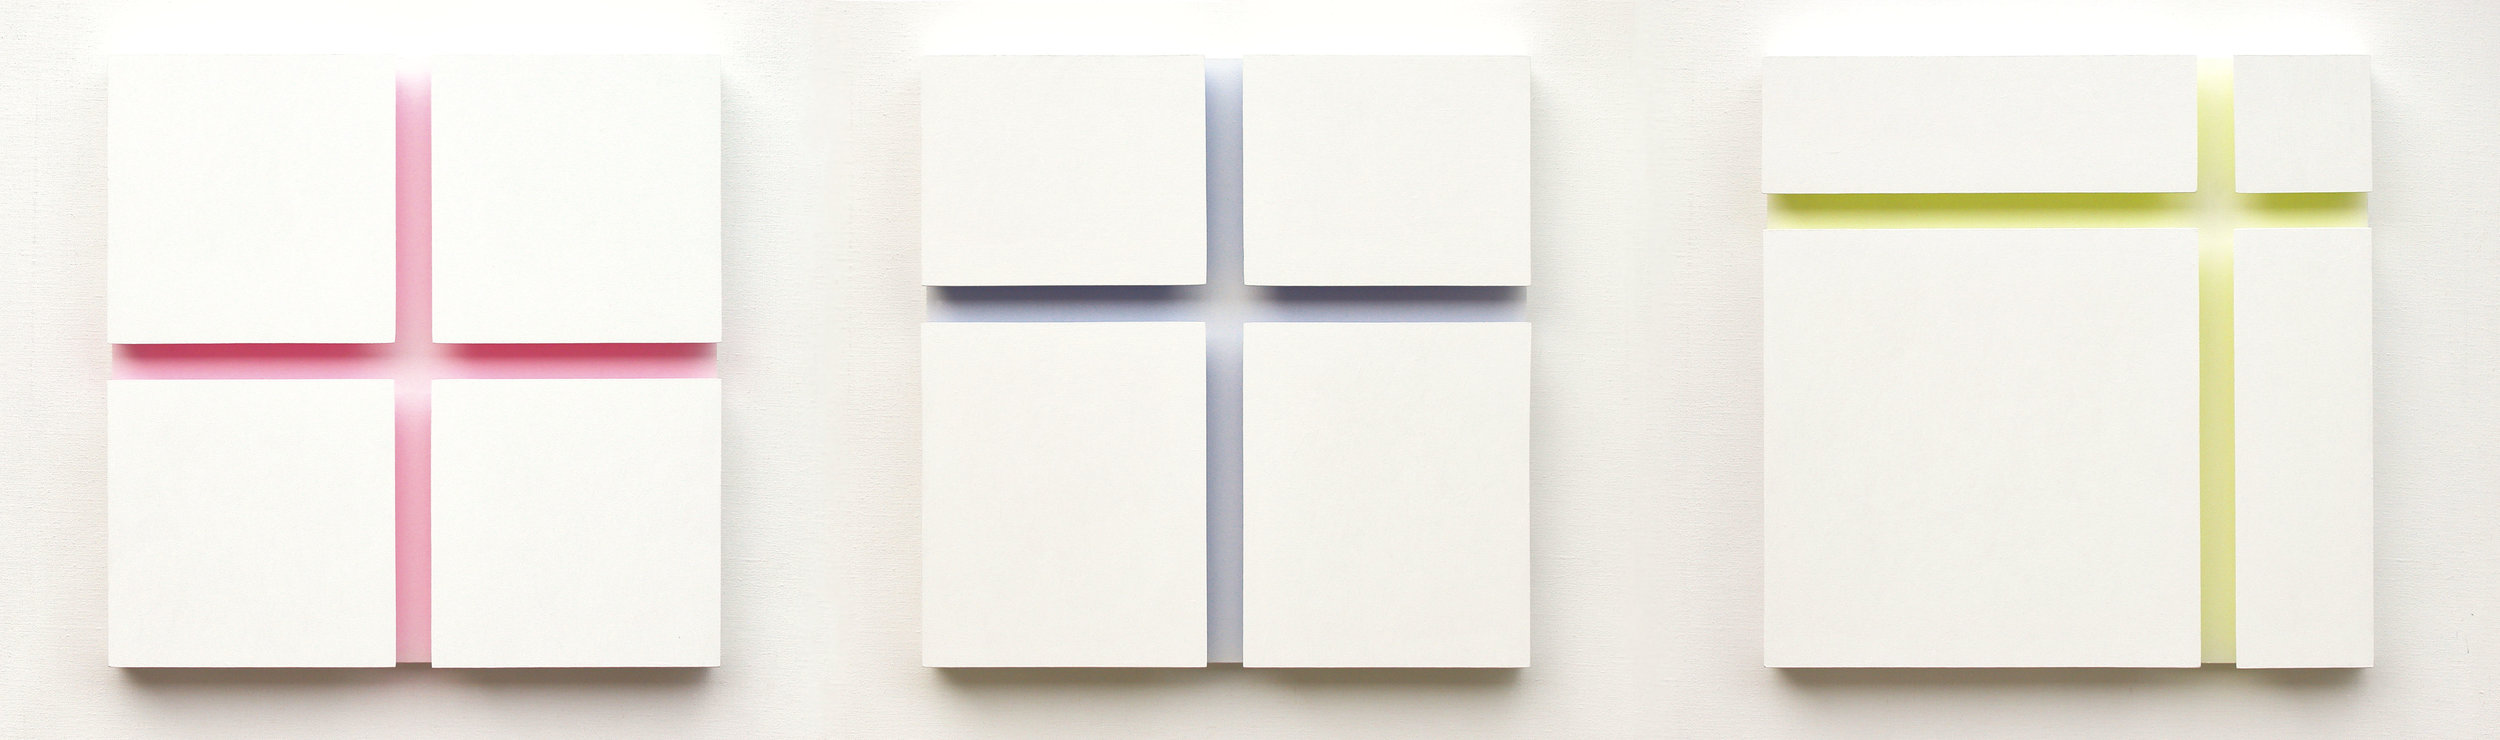 akril, les, trikrat 50 x 50 cm, 2005